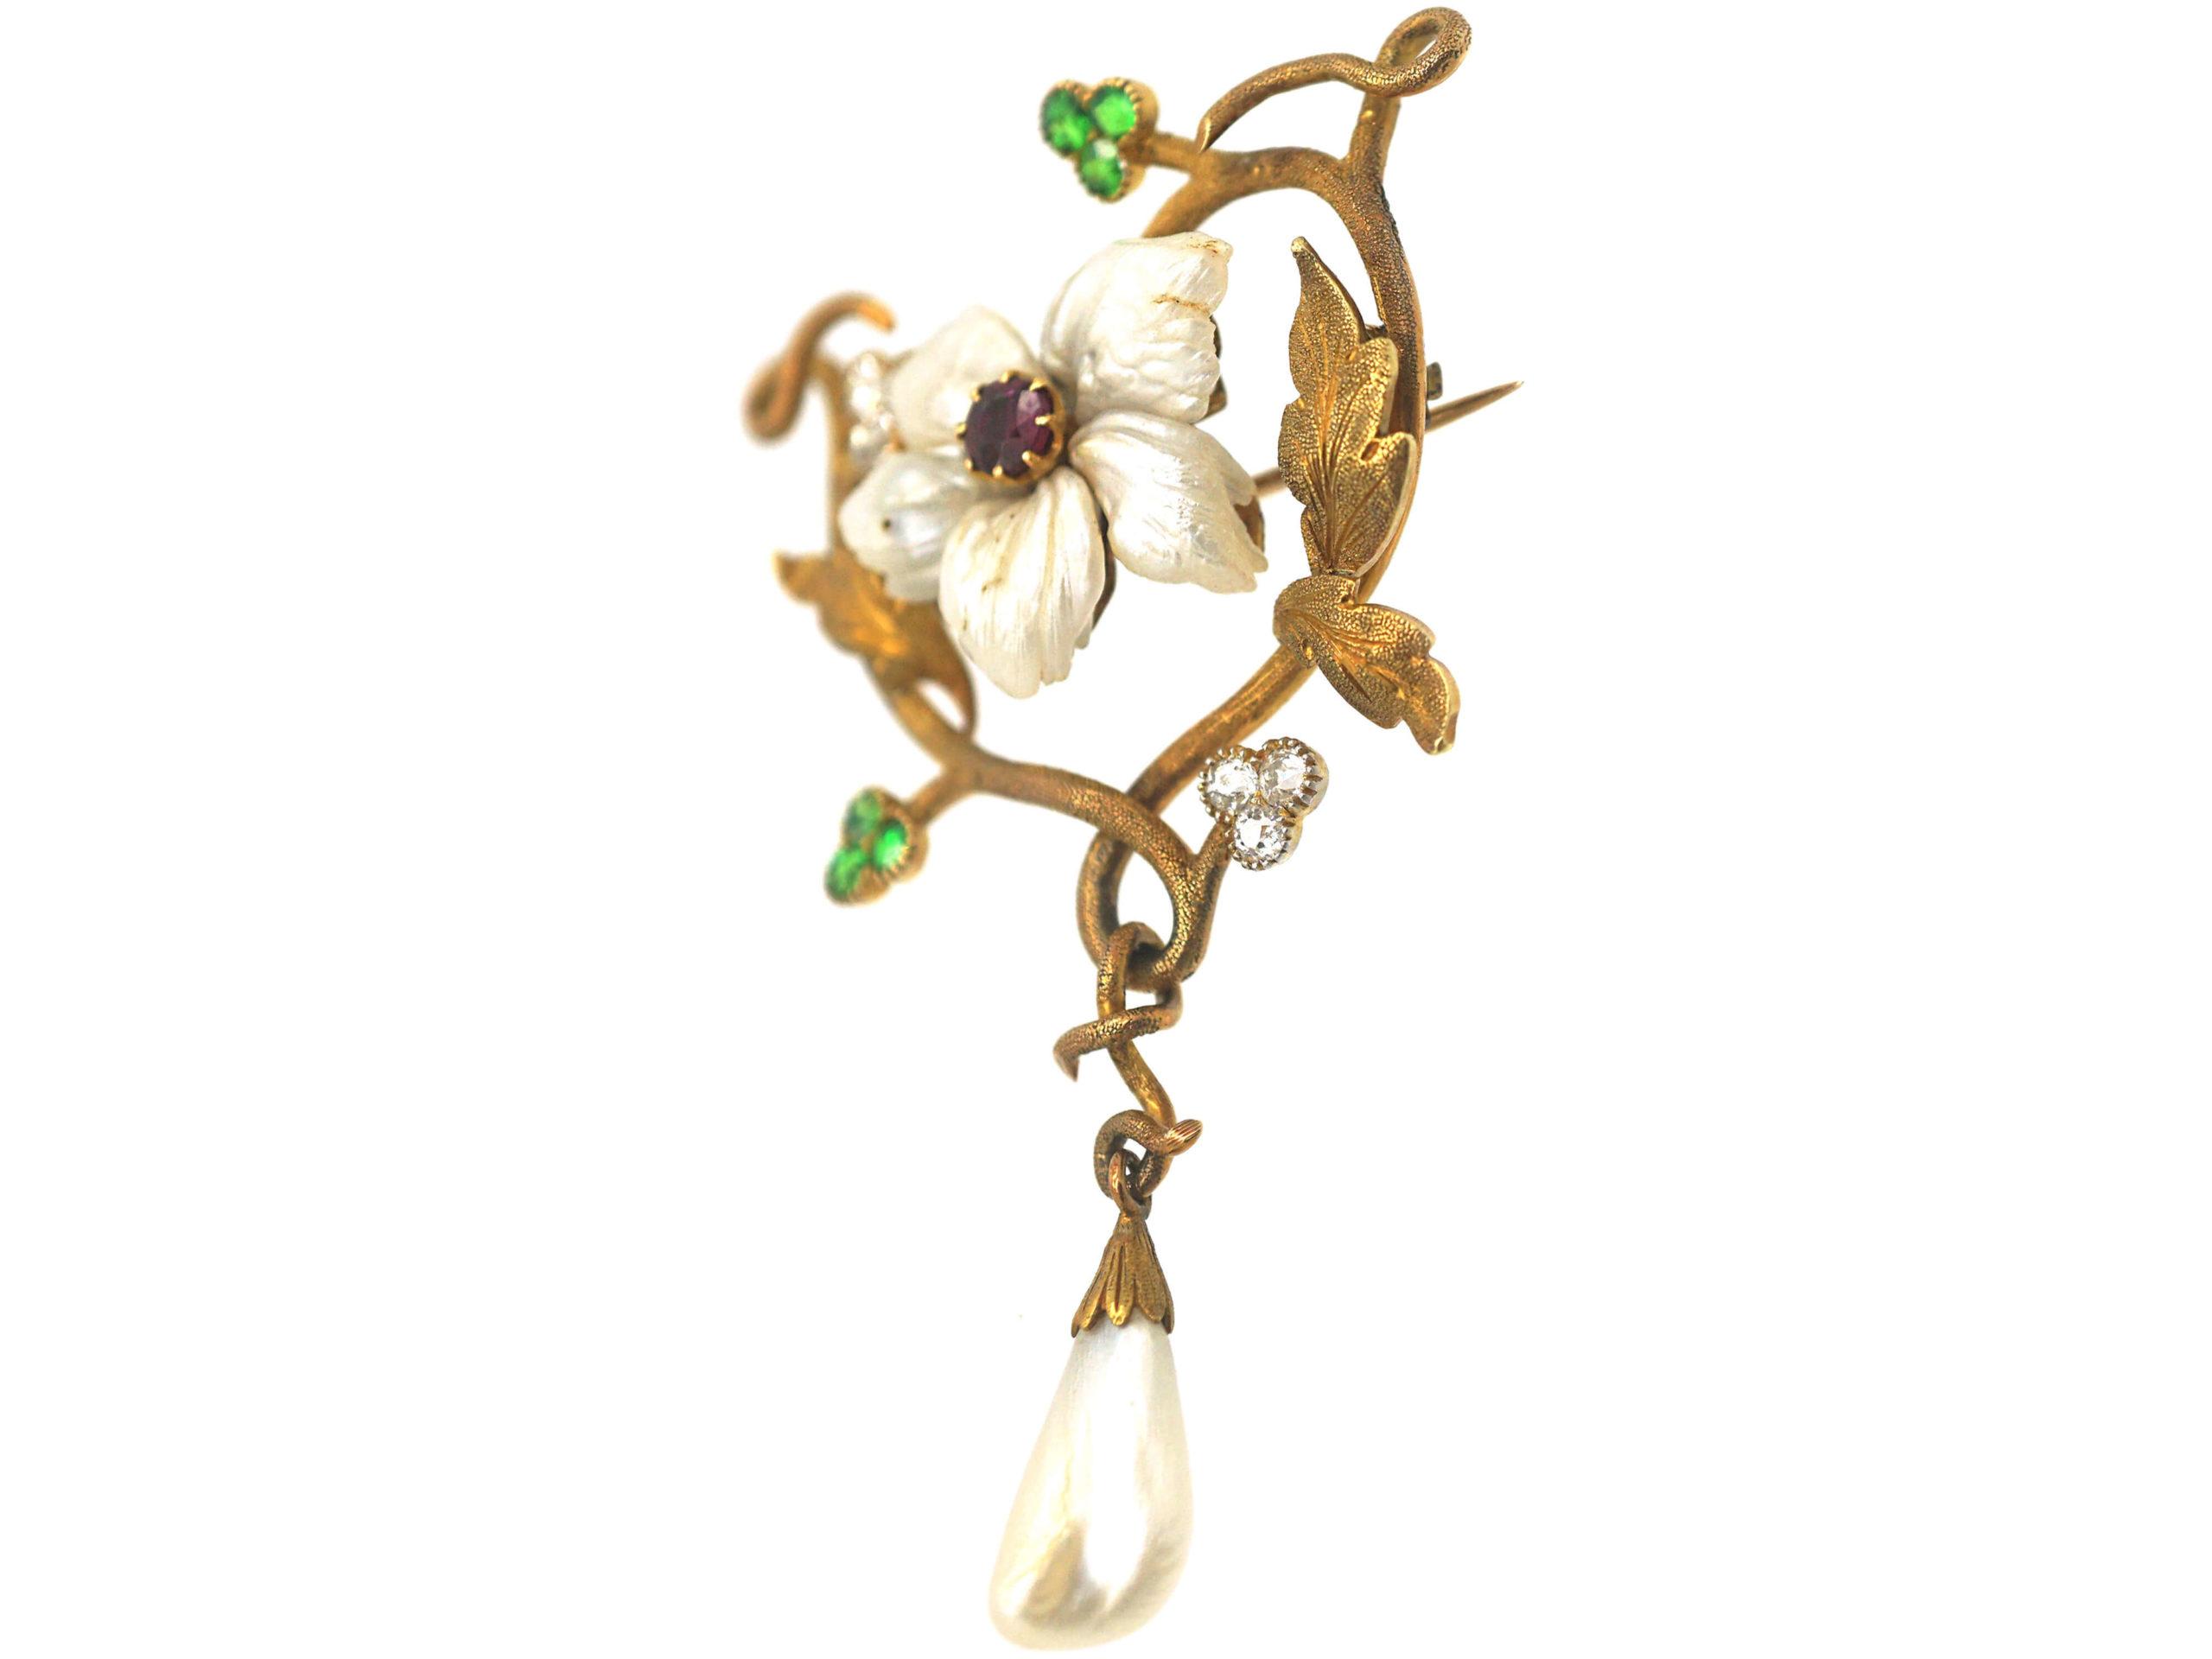 Art Nouveau 18ct Gold Flower Brooch set with Demantoid Garnets,  Mississippi River Pearls & Diamonds